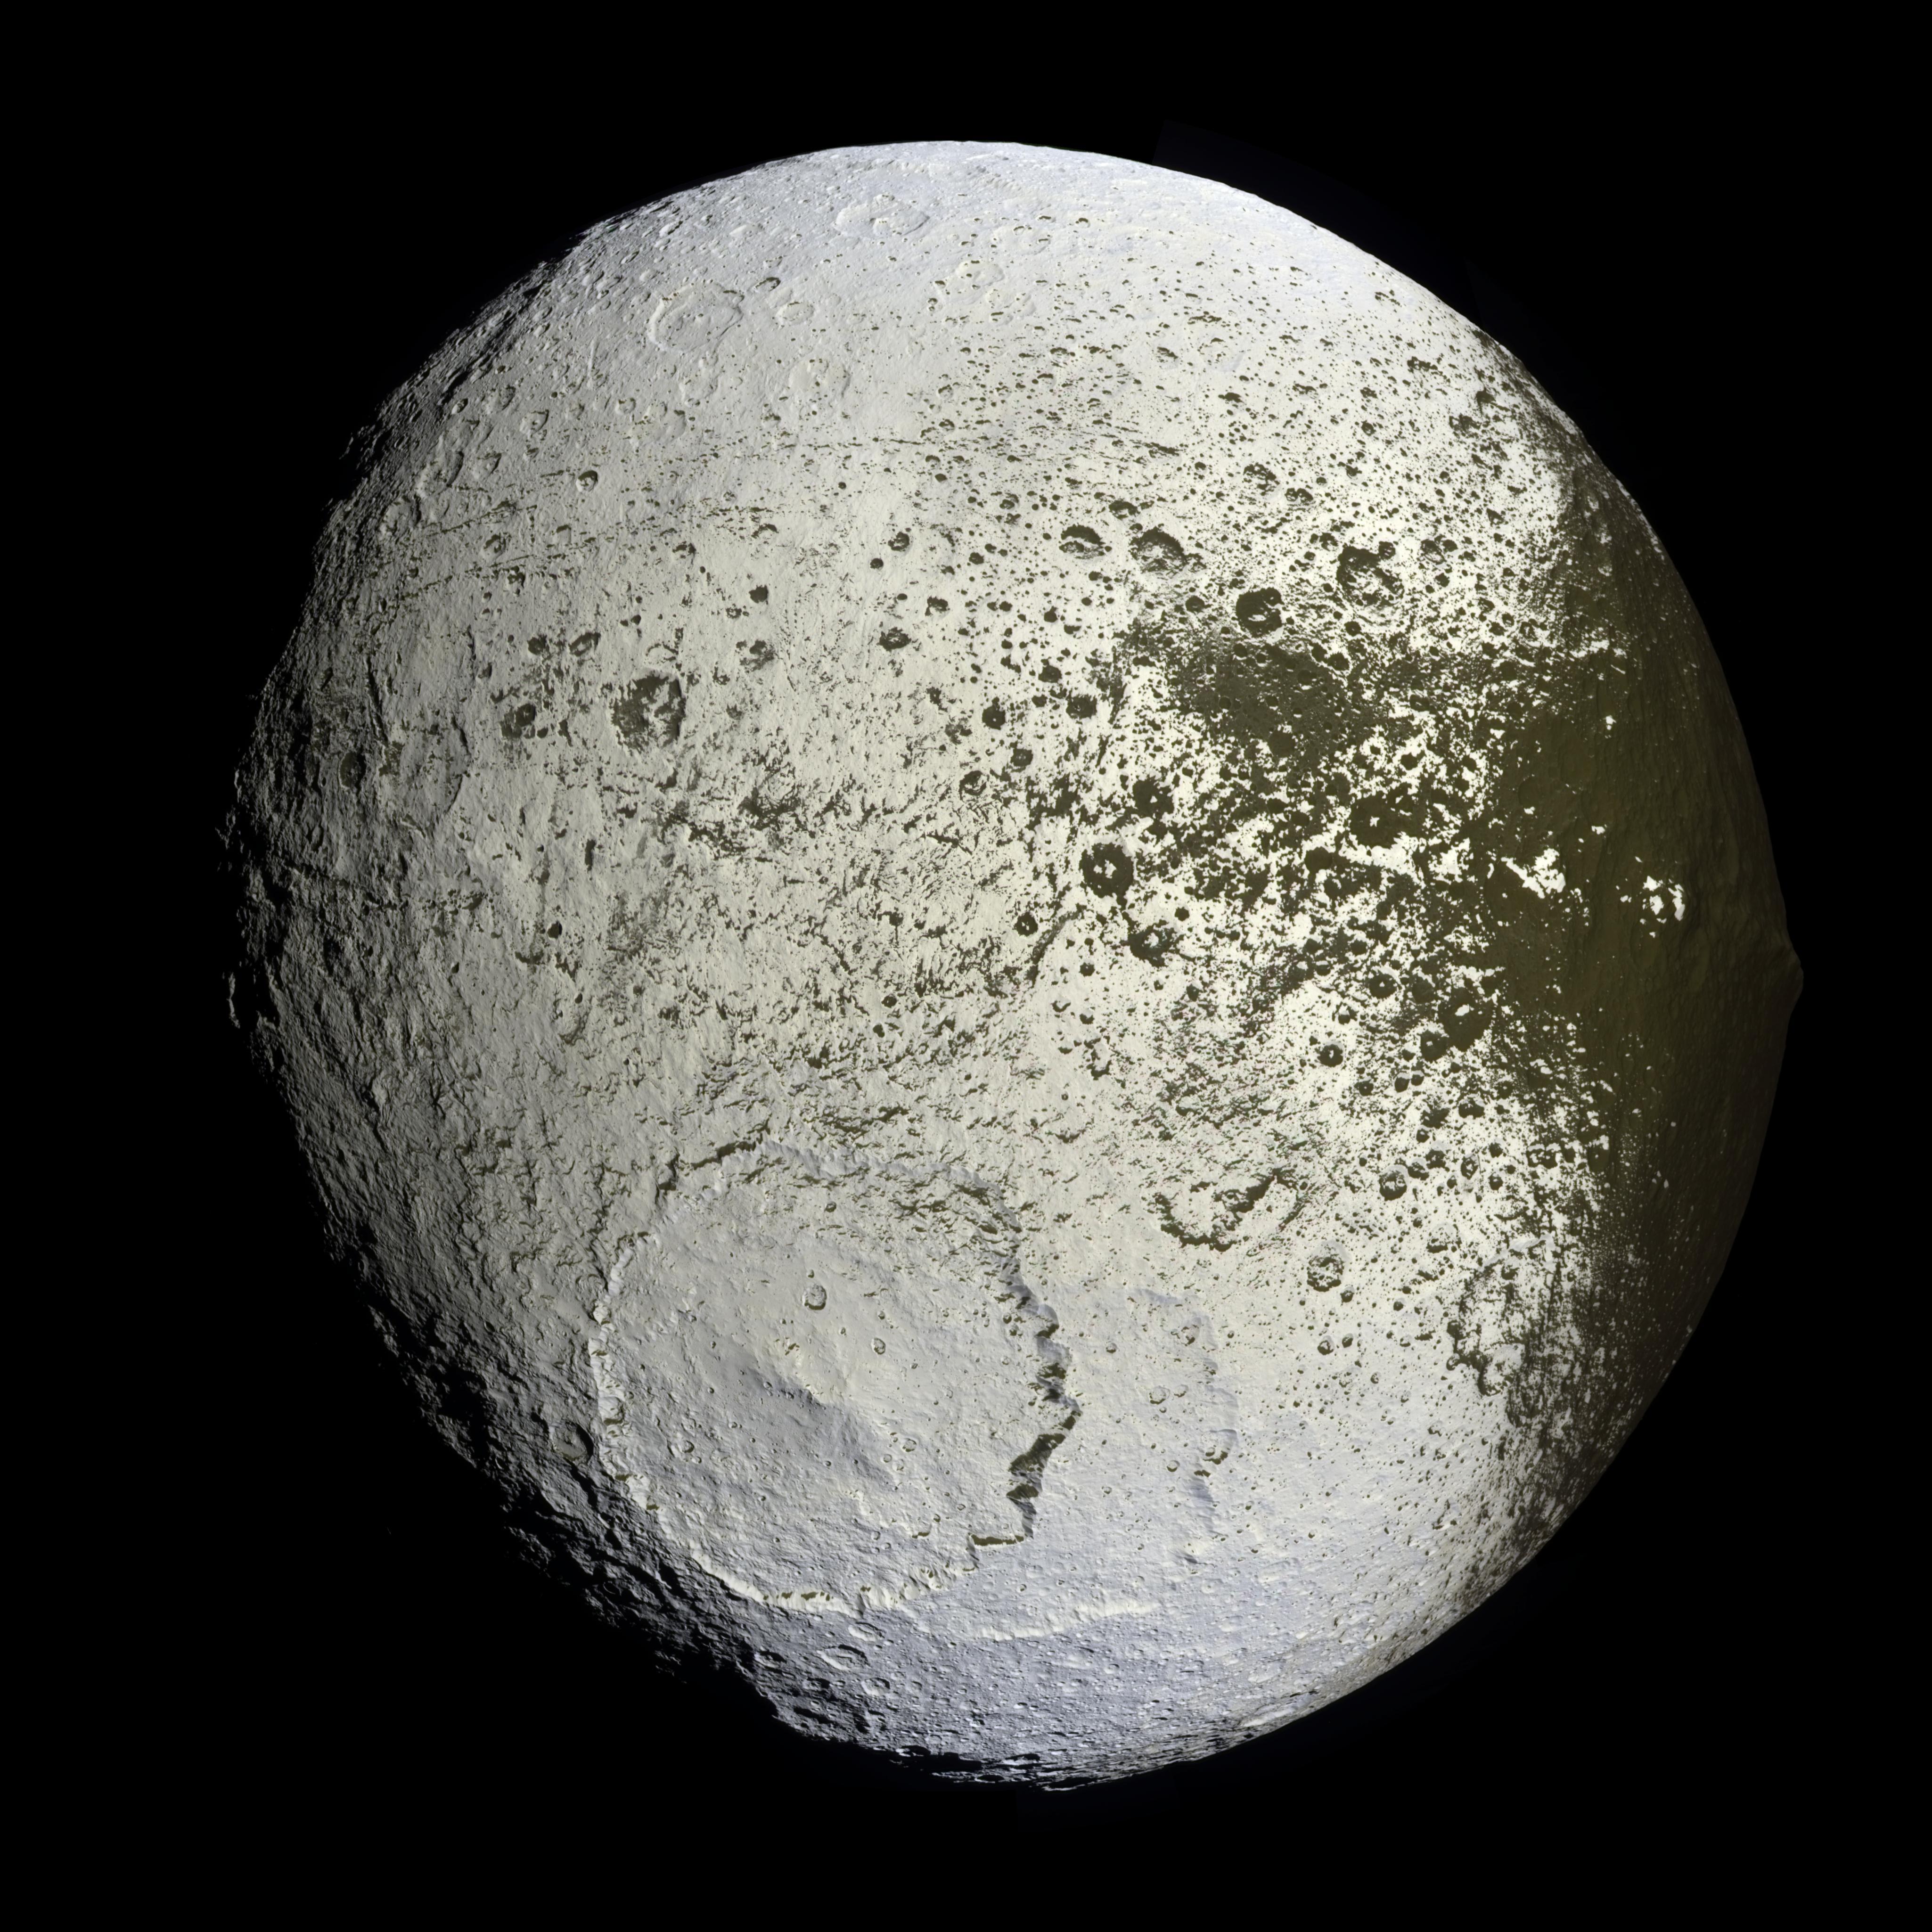 La luna Japeto es una estrella de la muerte ajena.